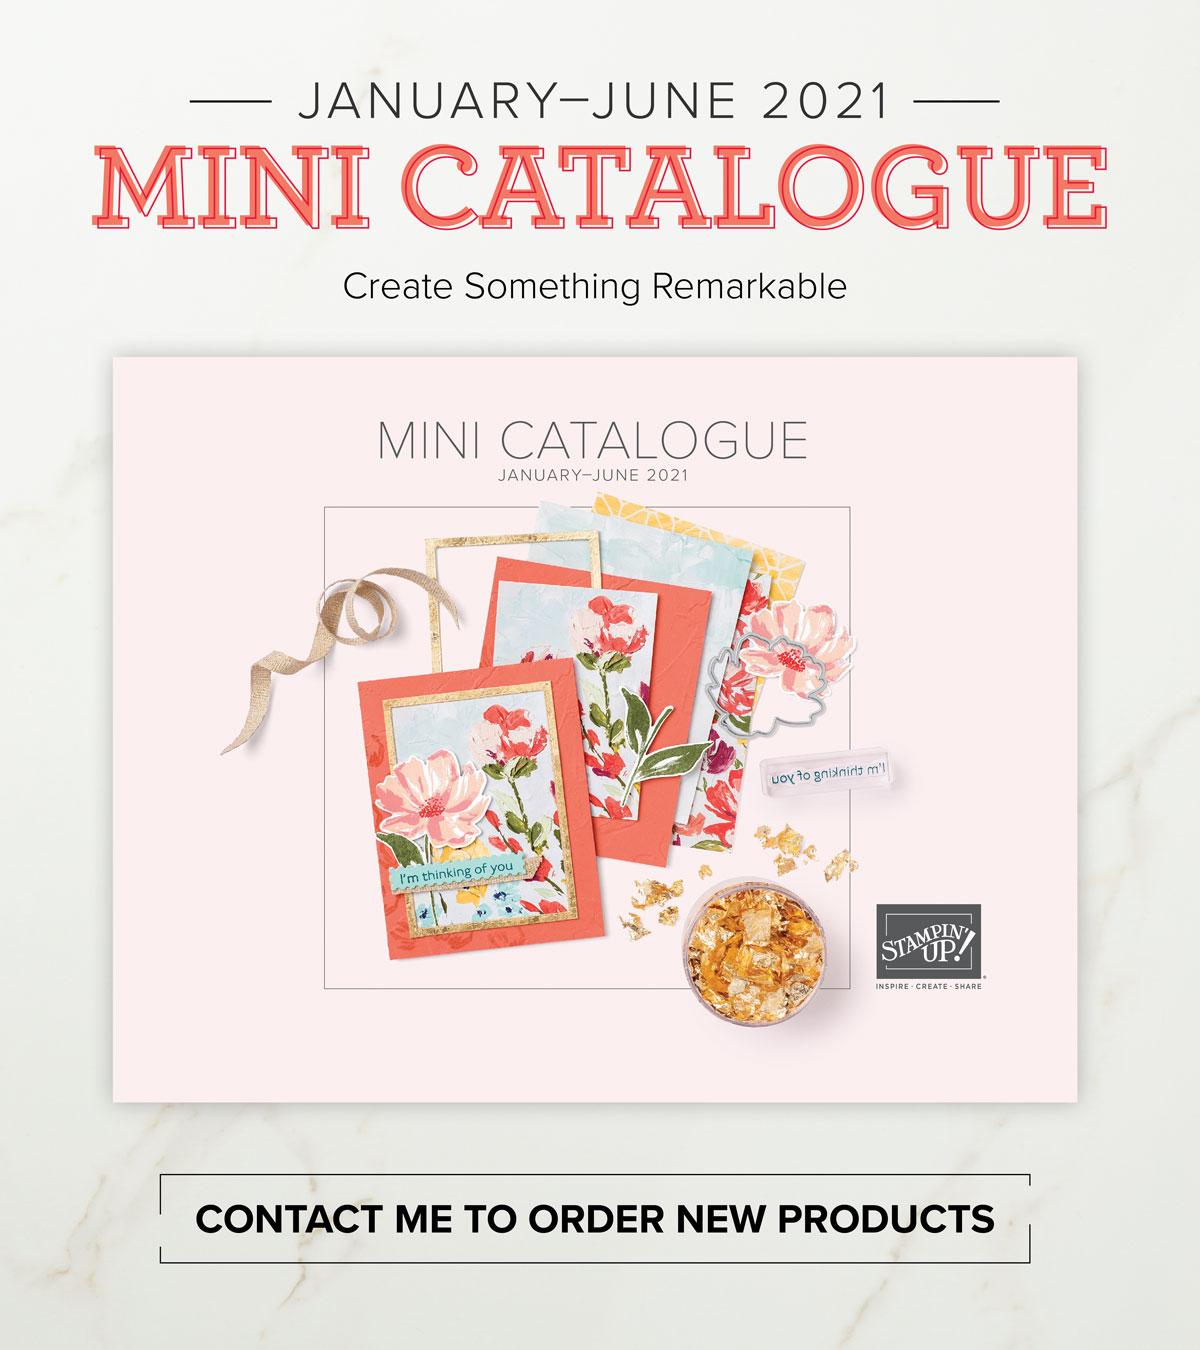 Stampin' Up! January-June 2021 Mini Catalogue